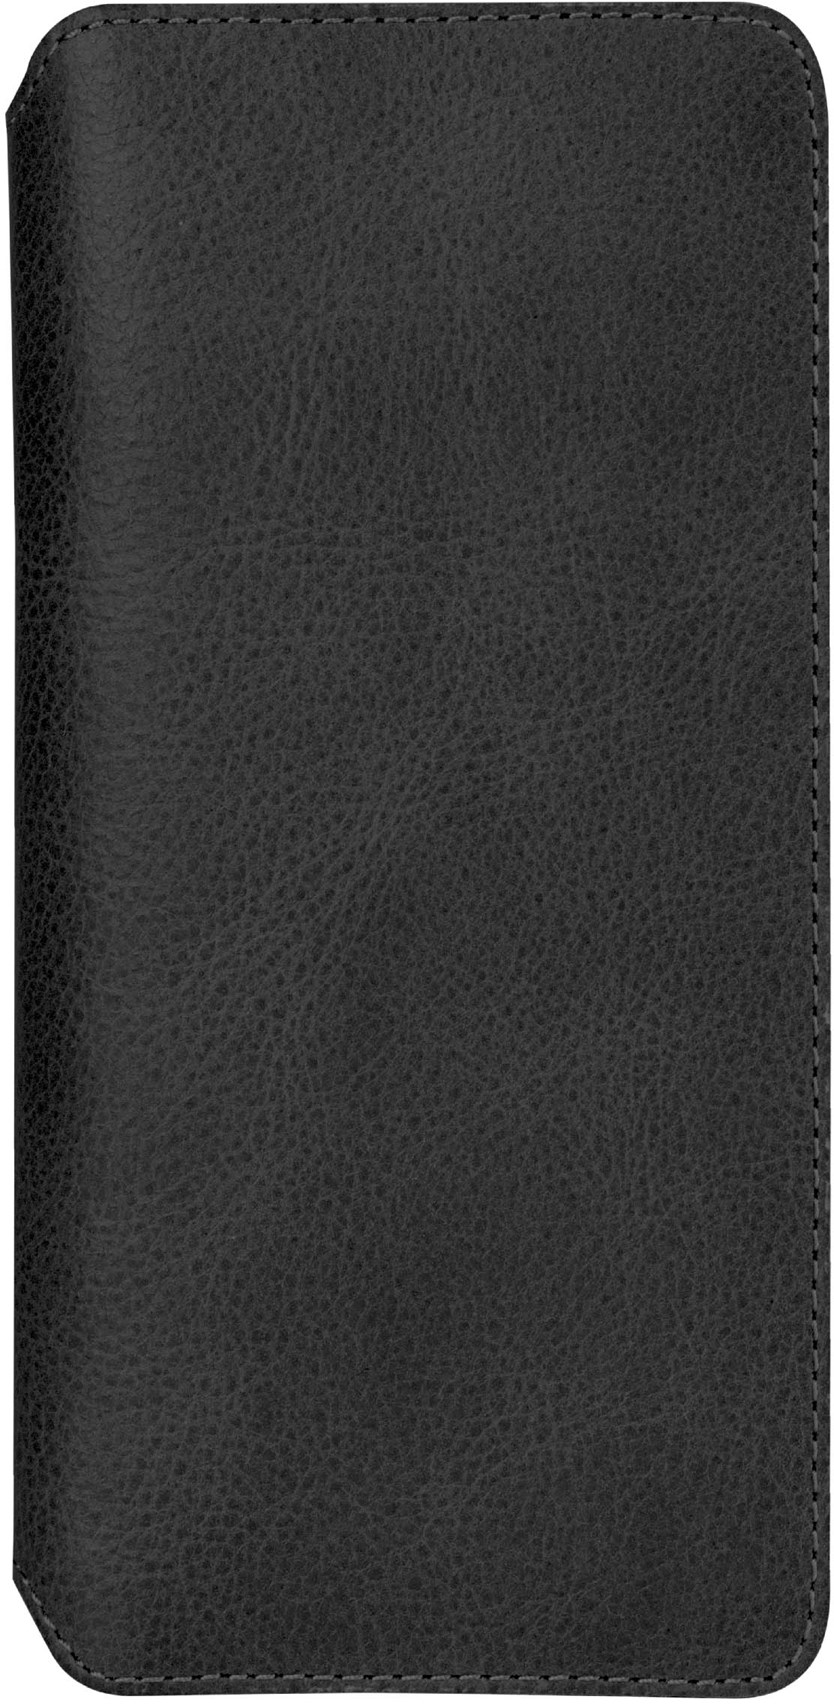 Krusell Sunne Phonewallet Samsung Galaxy S20 Plus Vintage Black